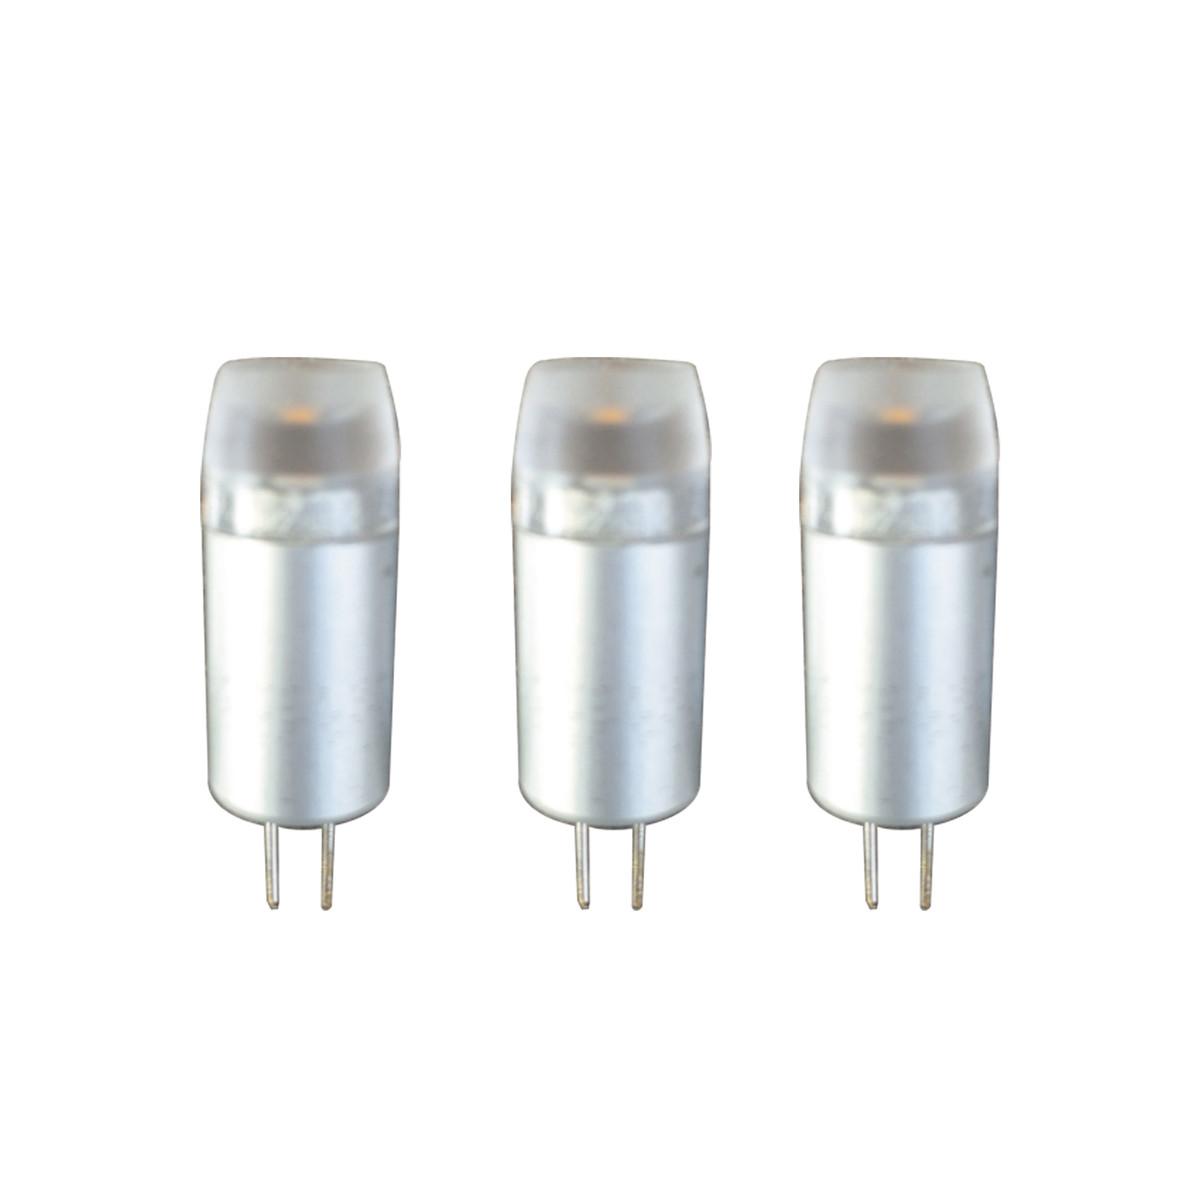 Lampadine a led g4 luce fredda prezzo e offerte sottocosto for Leroy merlin lampadine led